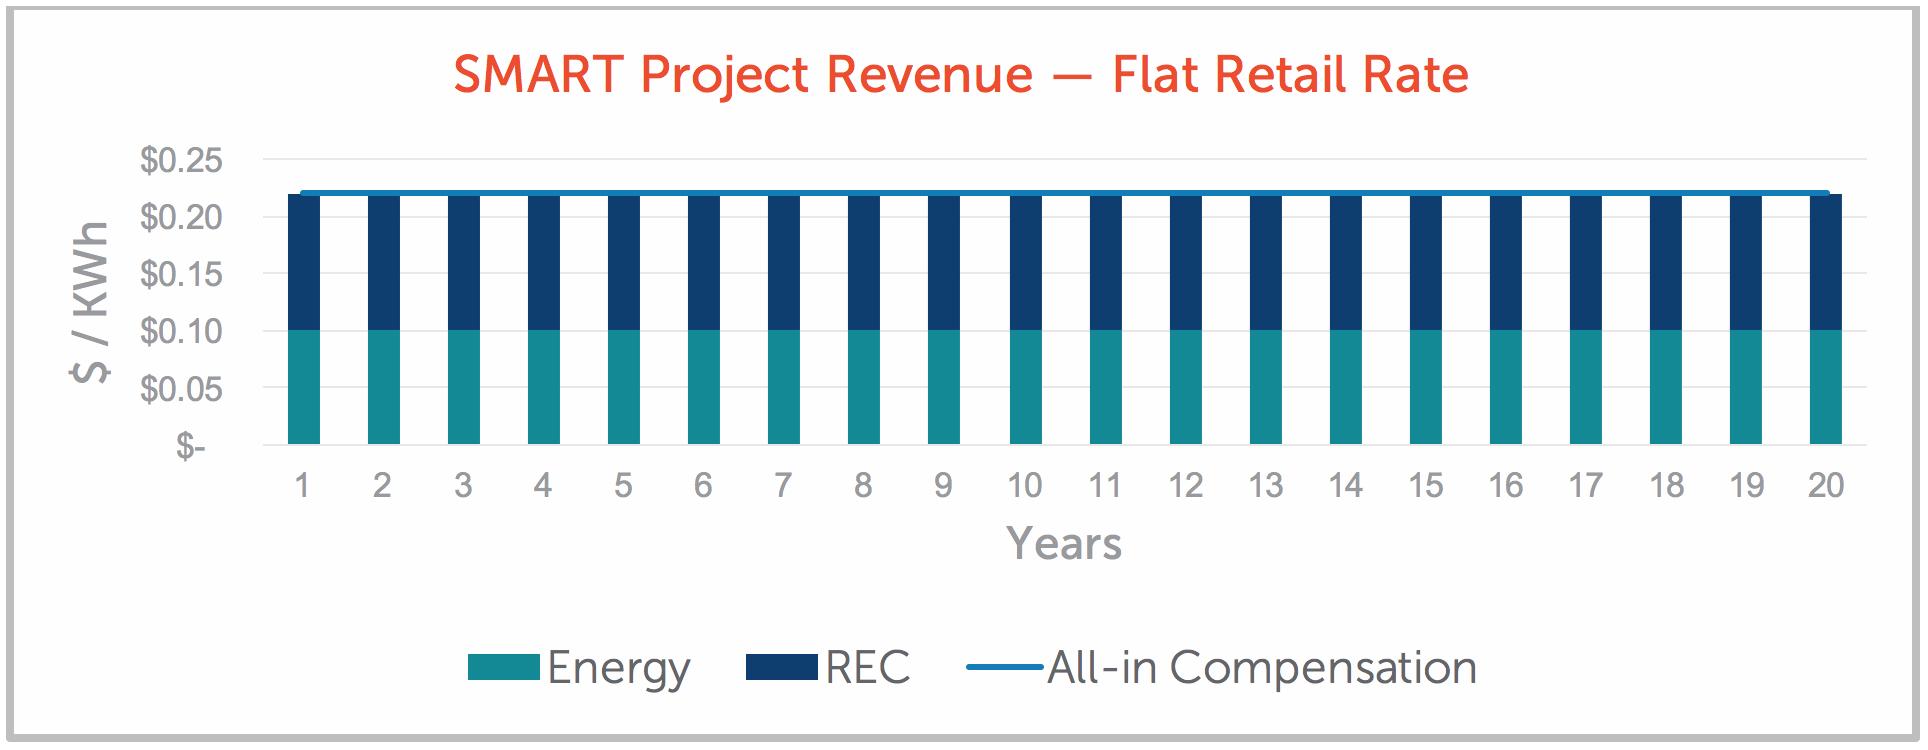 SMART Project Revenue — Flat Retail Rate